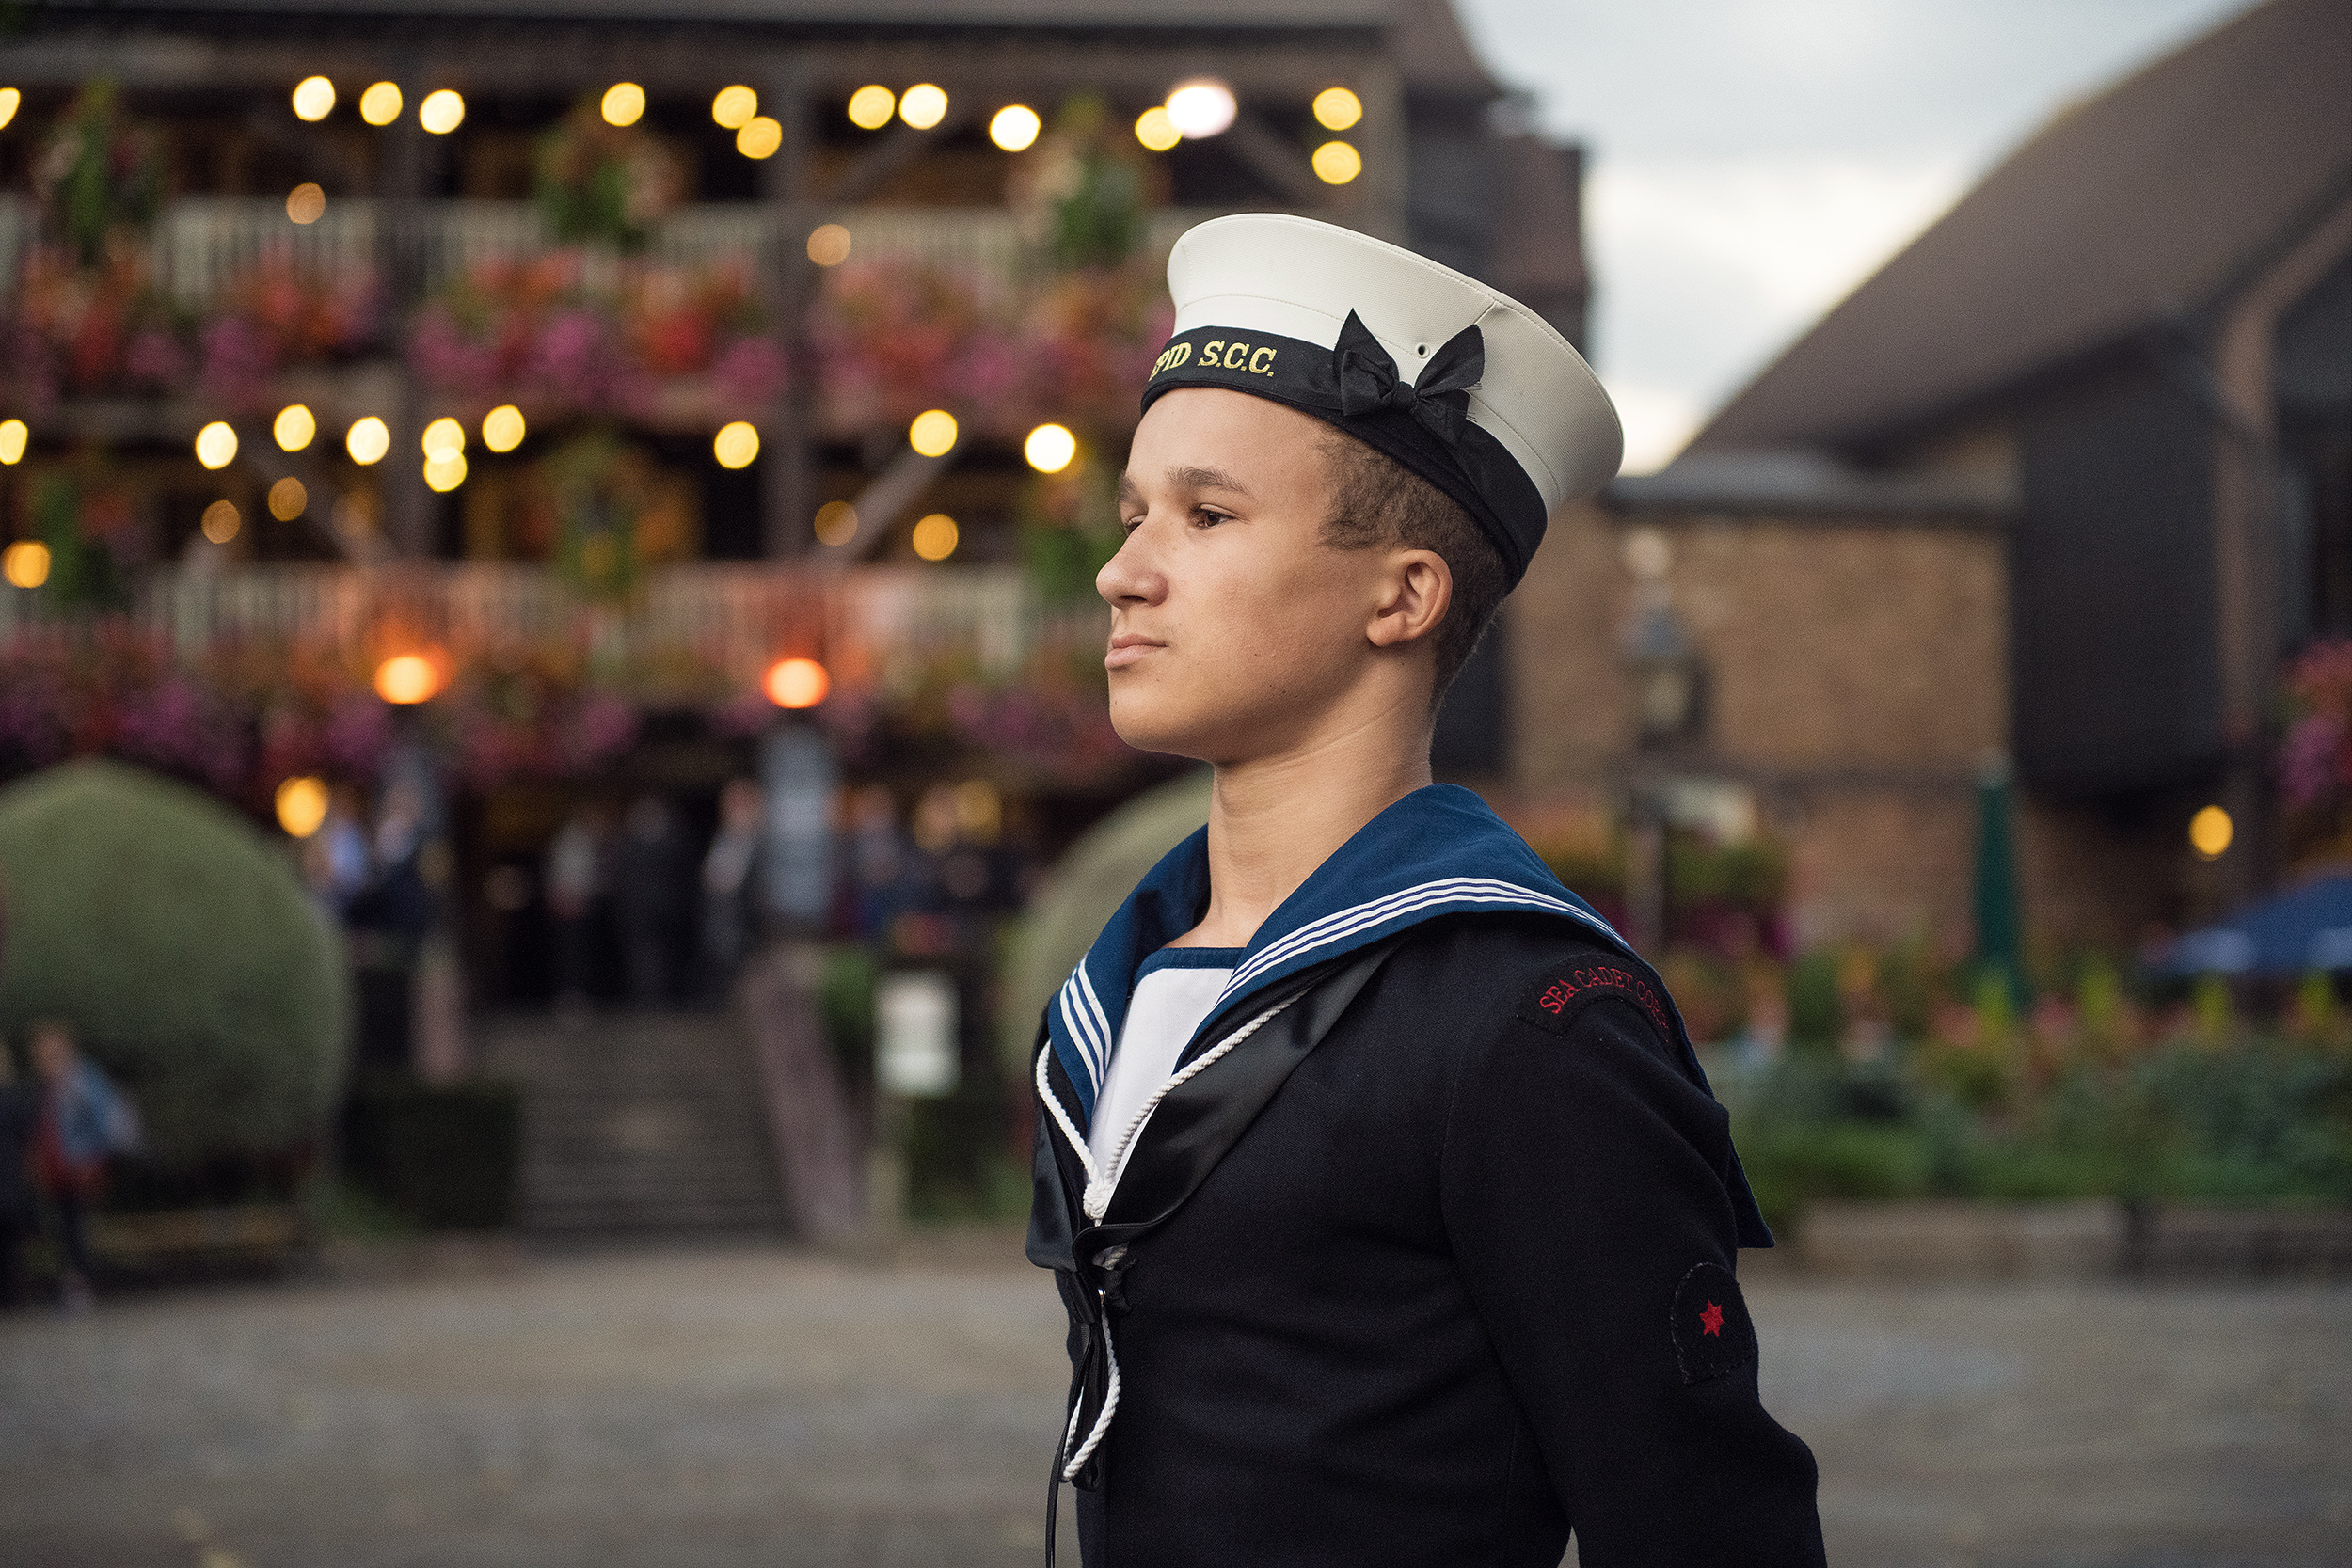 sea+cadets+ts+stellios+2018-99.jpg